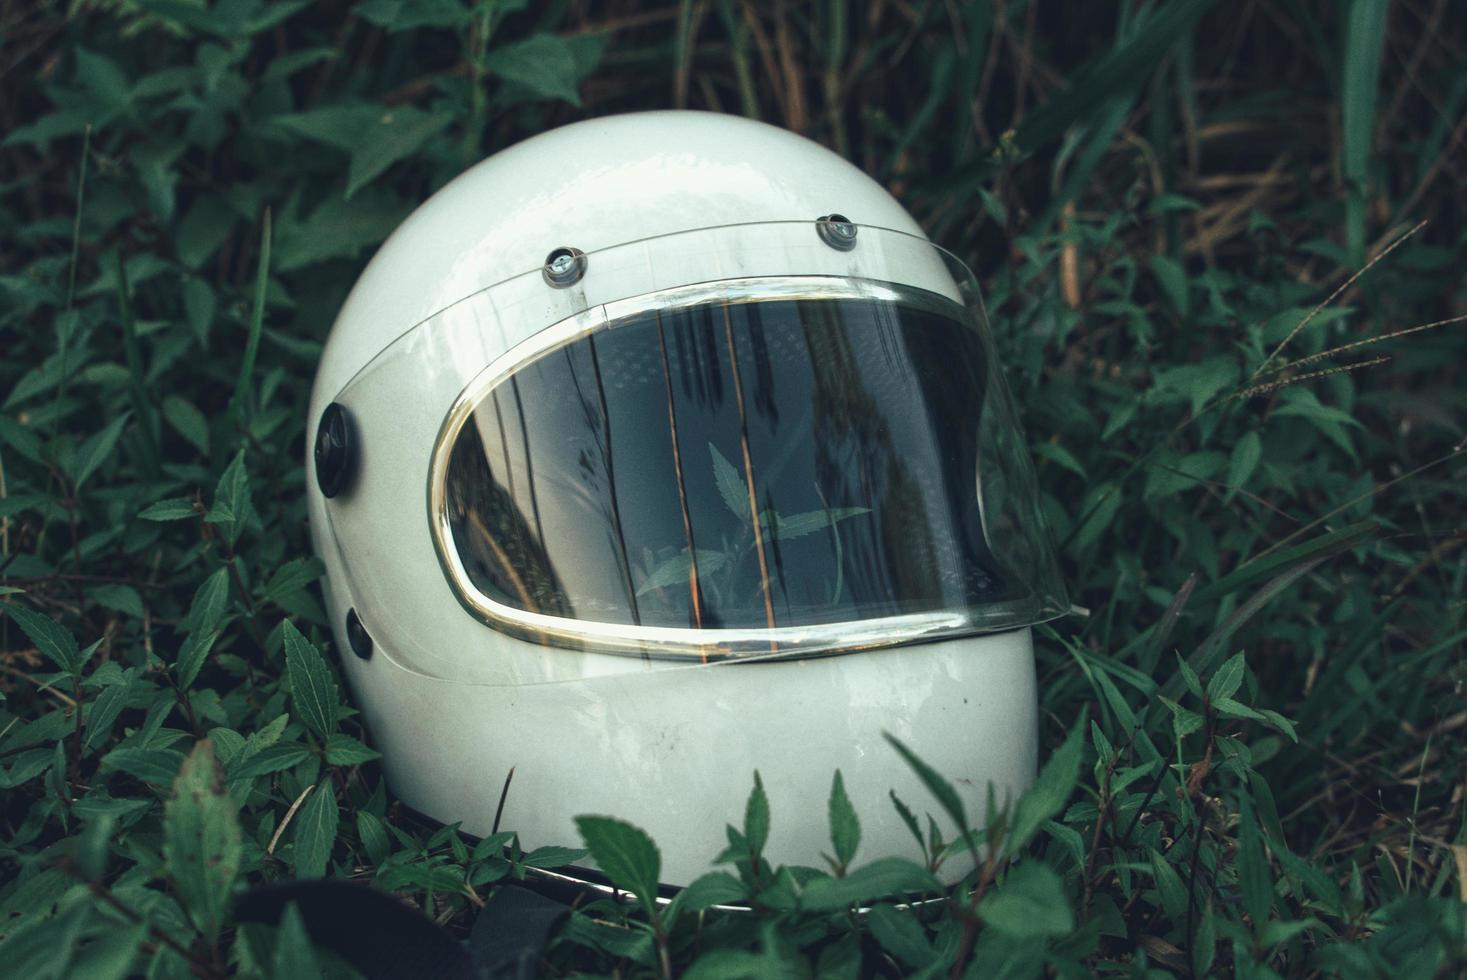 White helmet in grass photo